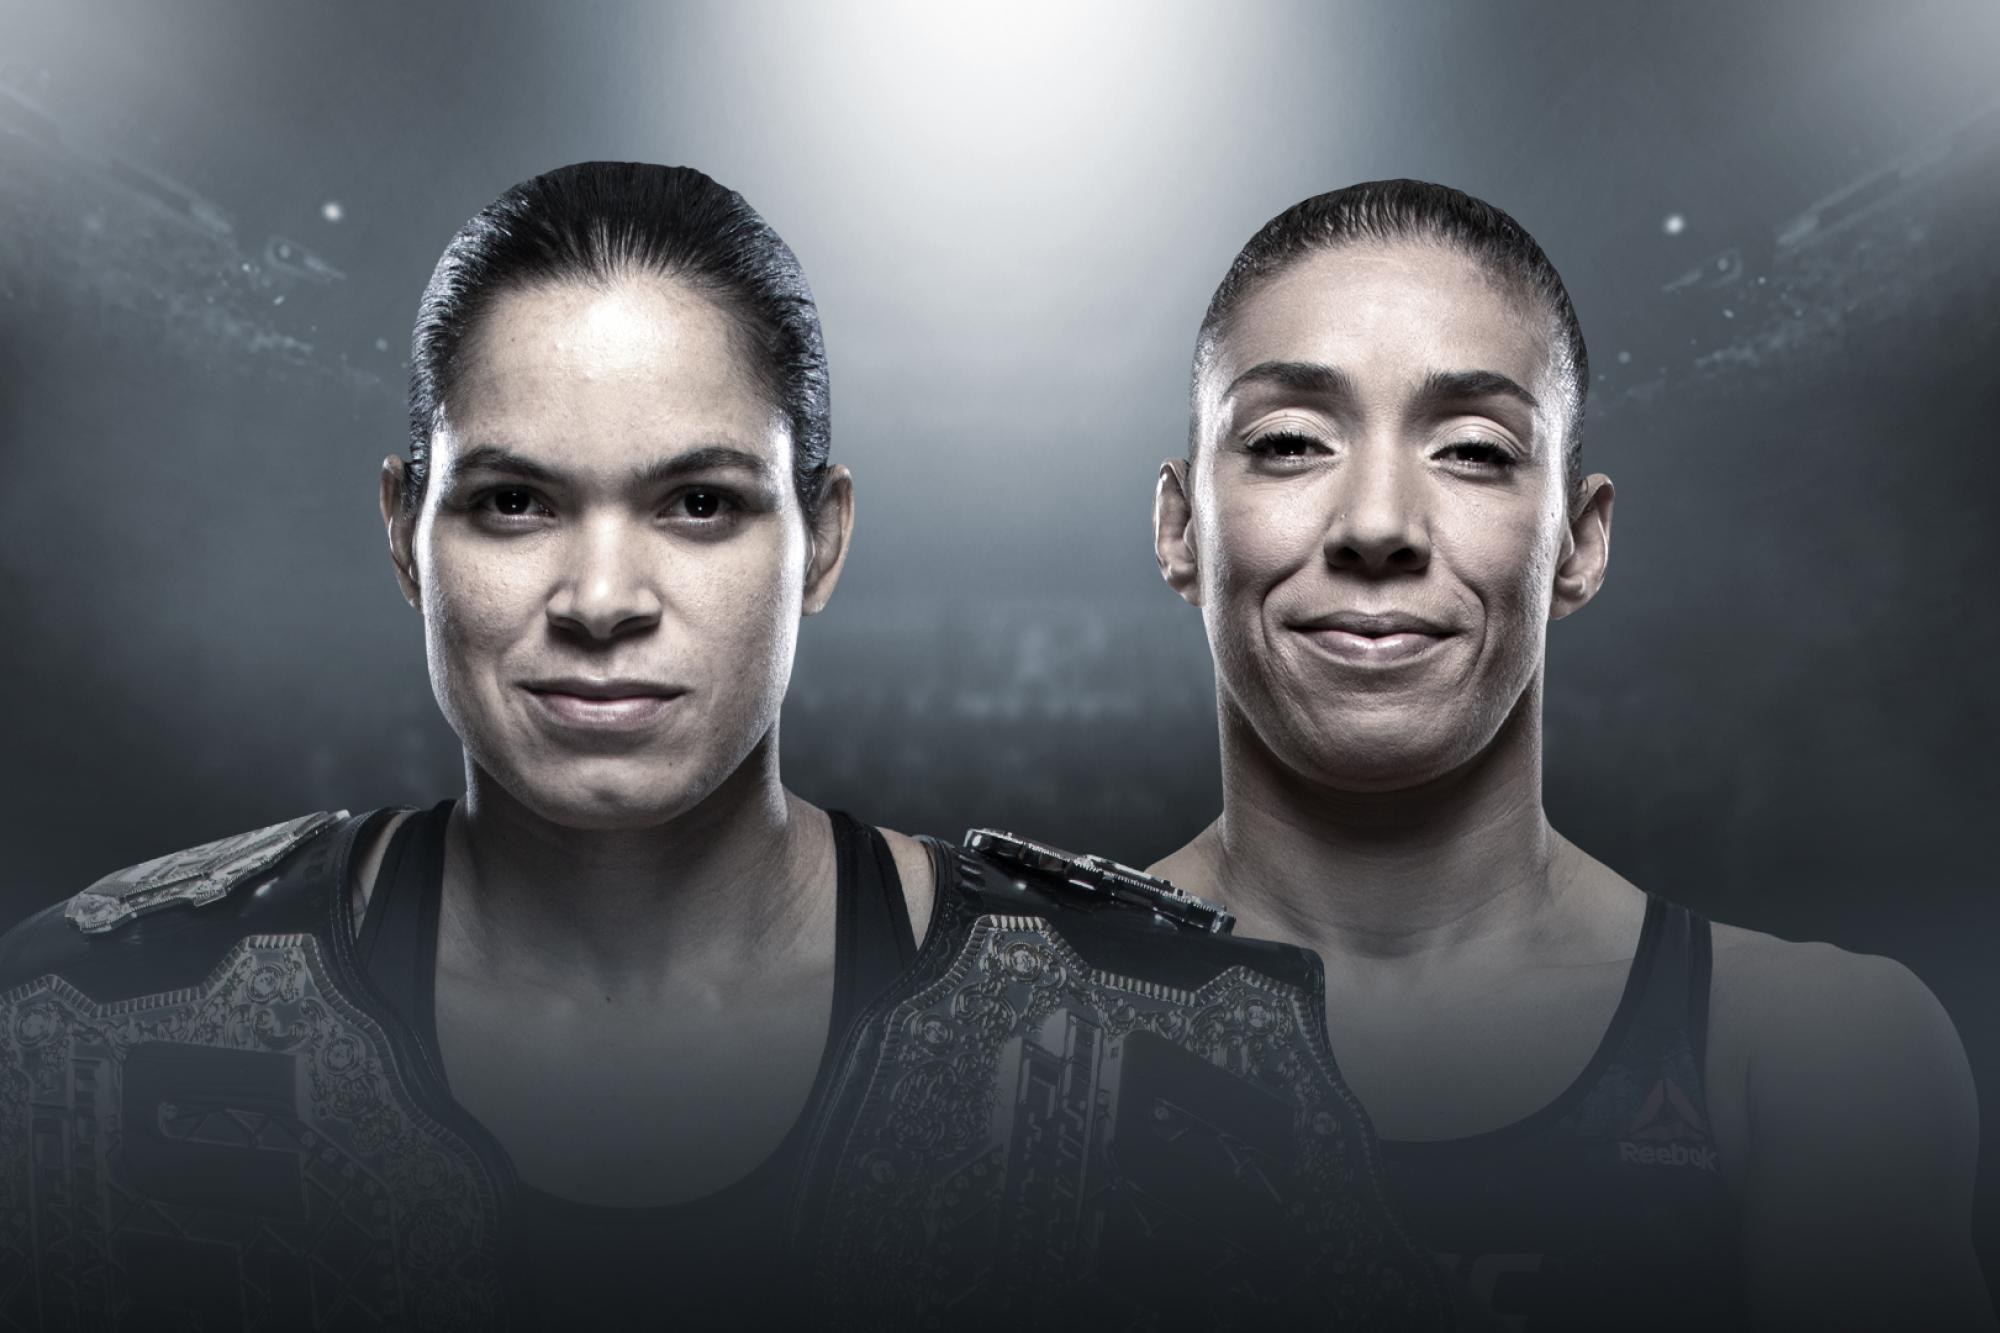 Amanda Nunes, GDR Rematch Set For UFC 245